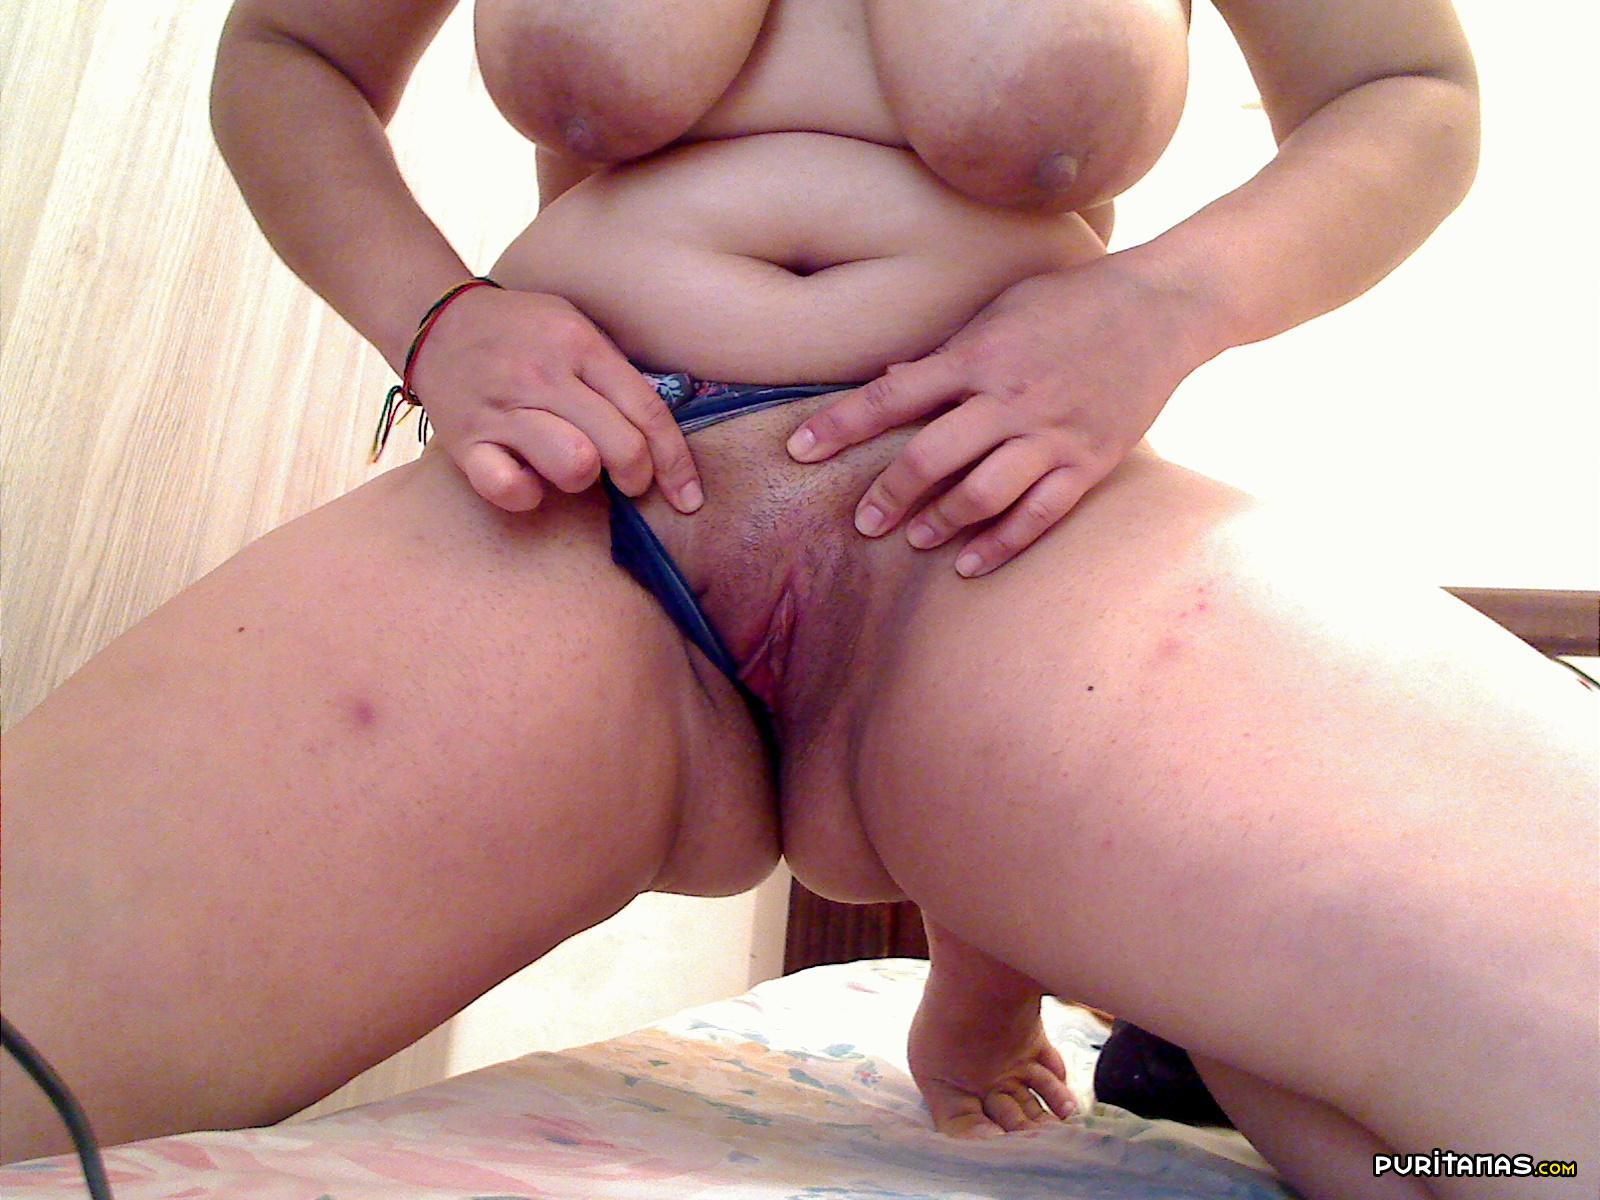 Asian and black gay porn bareback pics